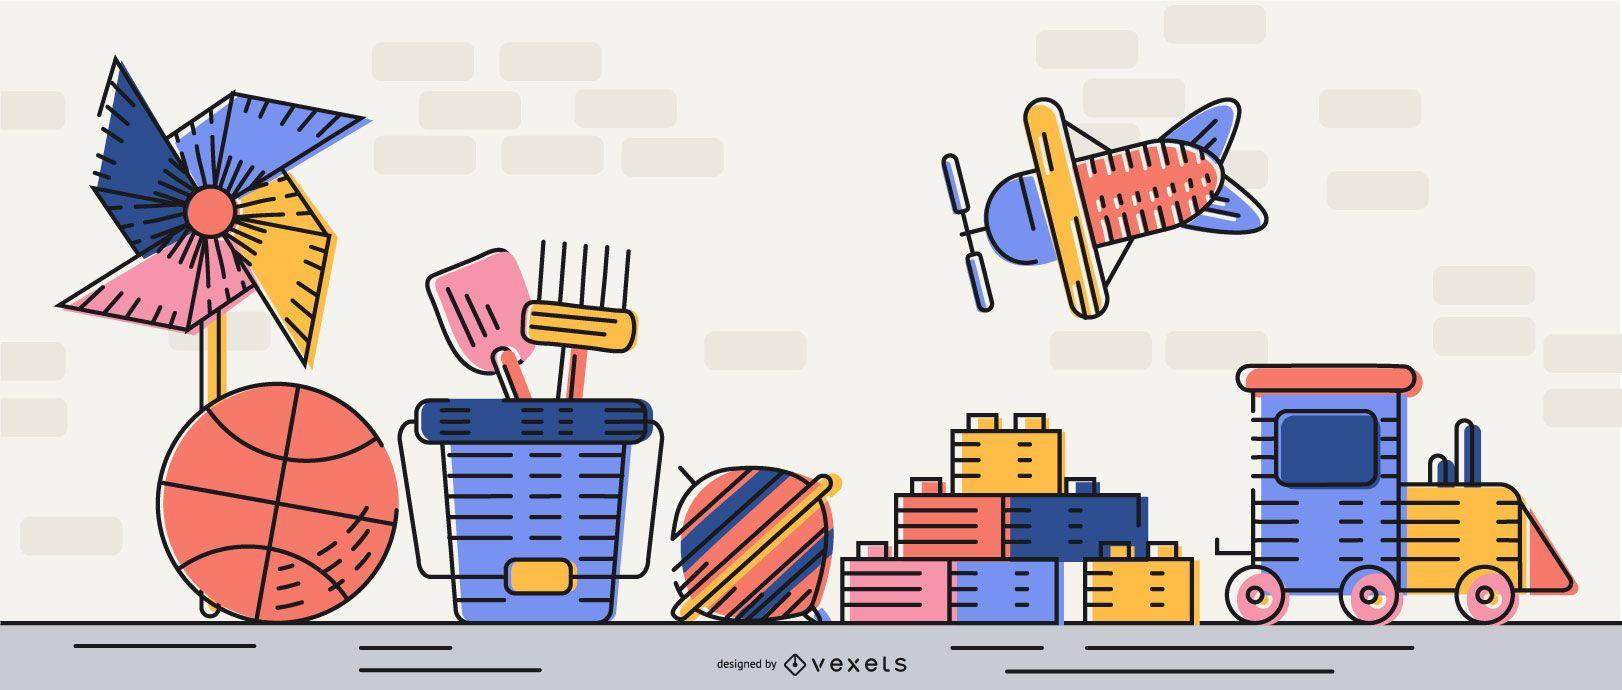 Simple Toys Illustration Design